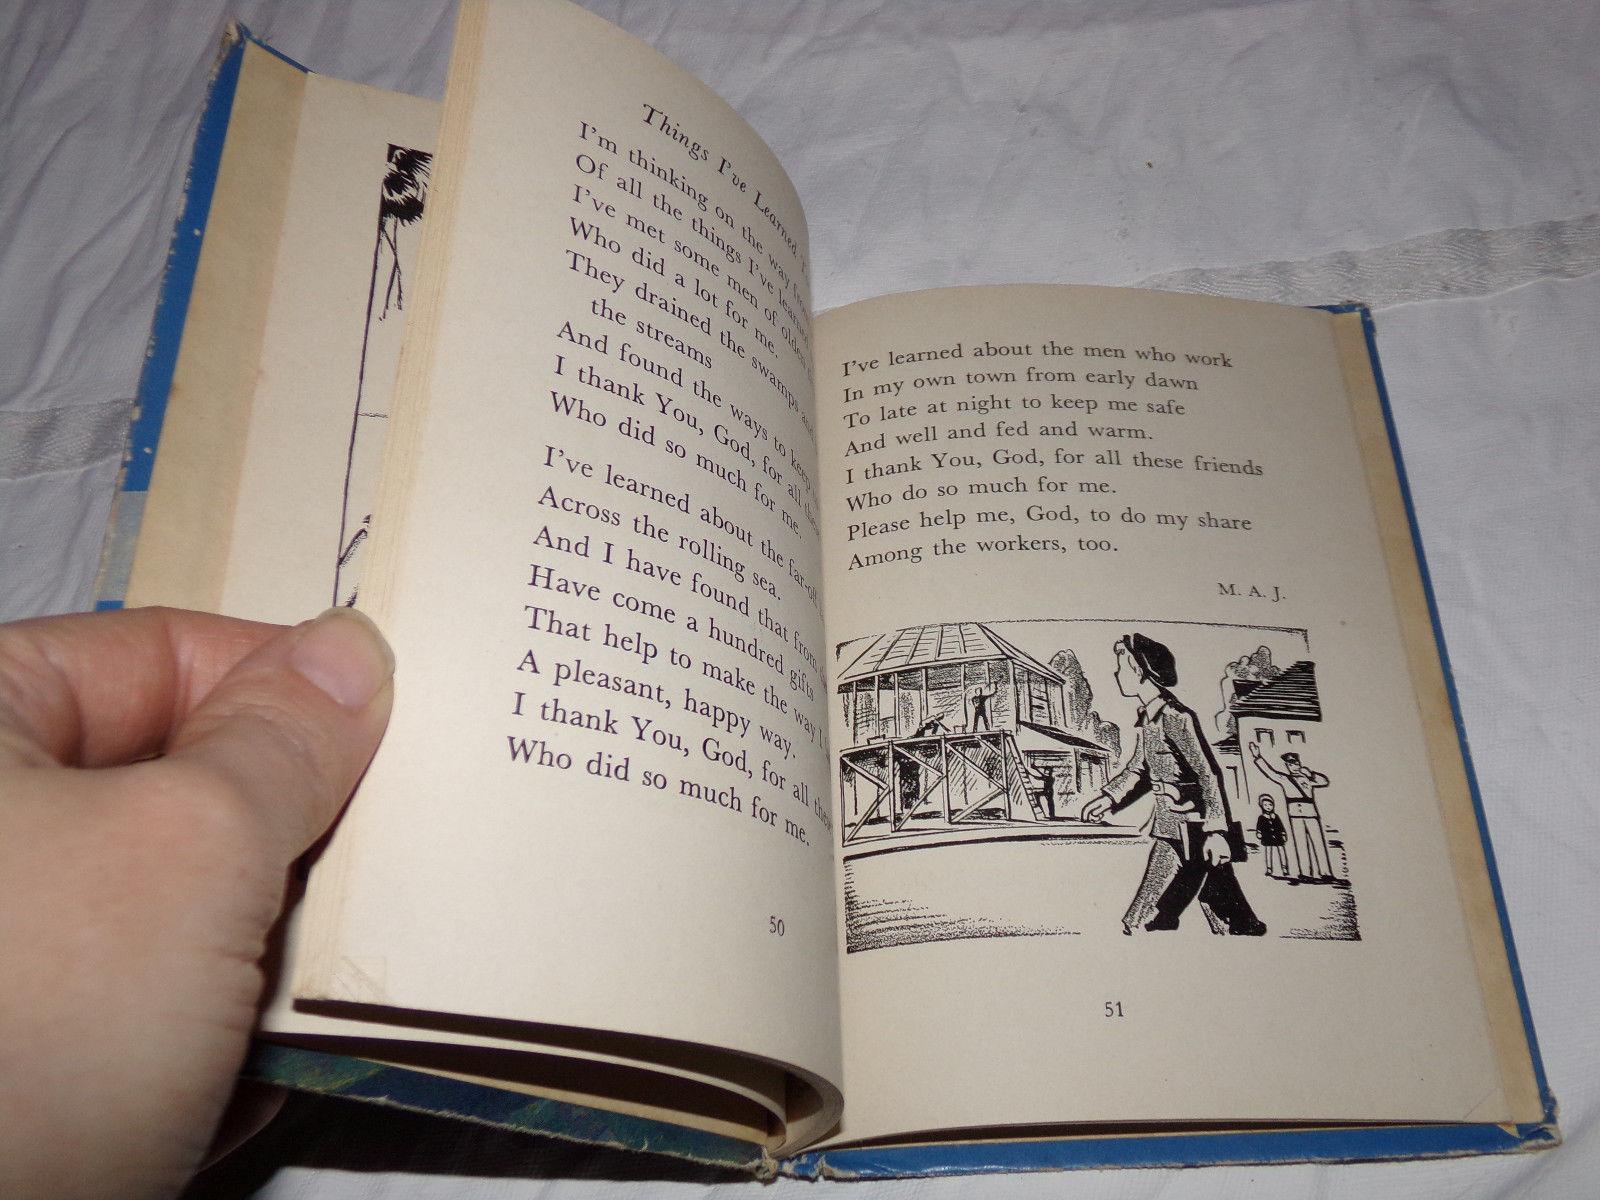 Vtg 1938 MY OWN BOOK OF PRAYERS Illustrated Children's Mary Alice Jones Stoddard